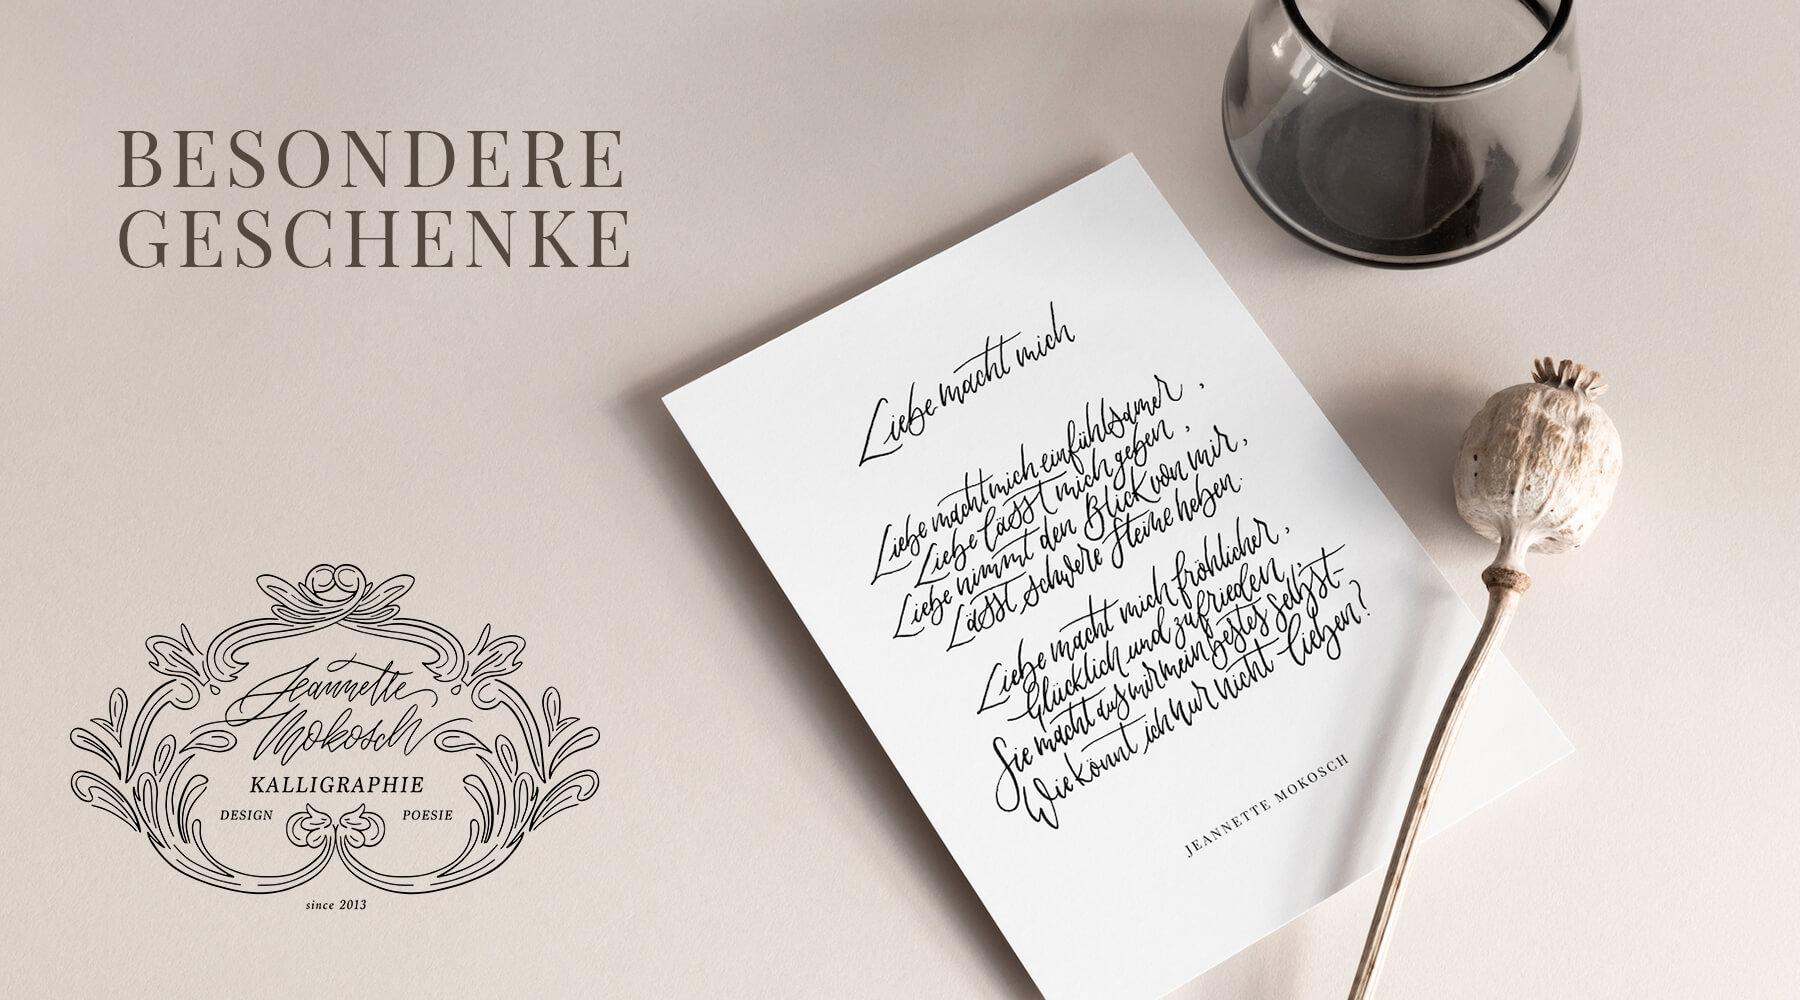 Besondere Geschenke Kalligrafie Kalligraphie Hand Lettering